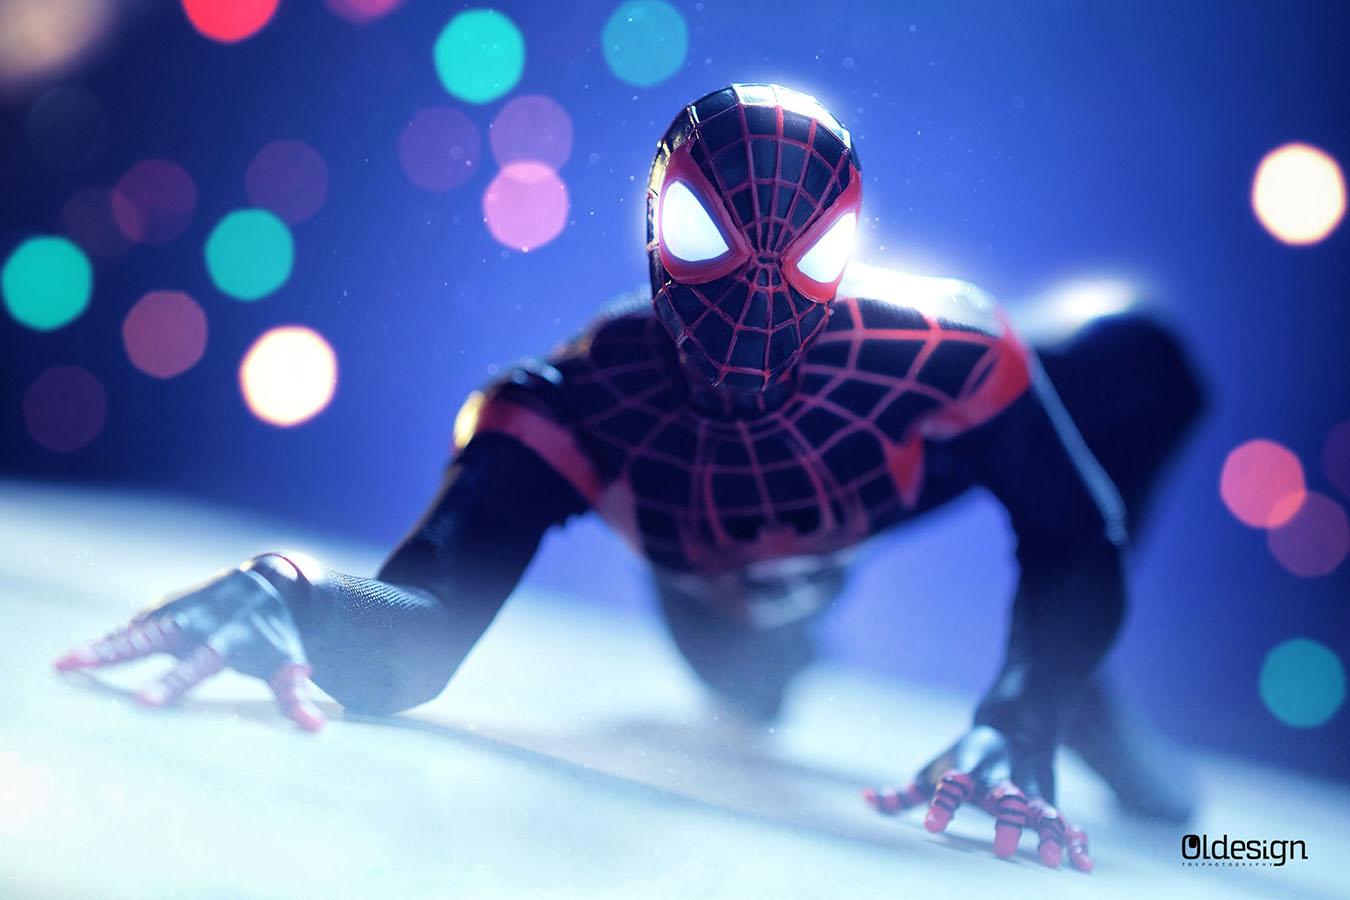 oldesign_spiderman_05